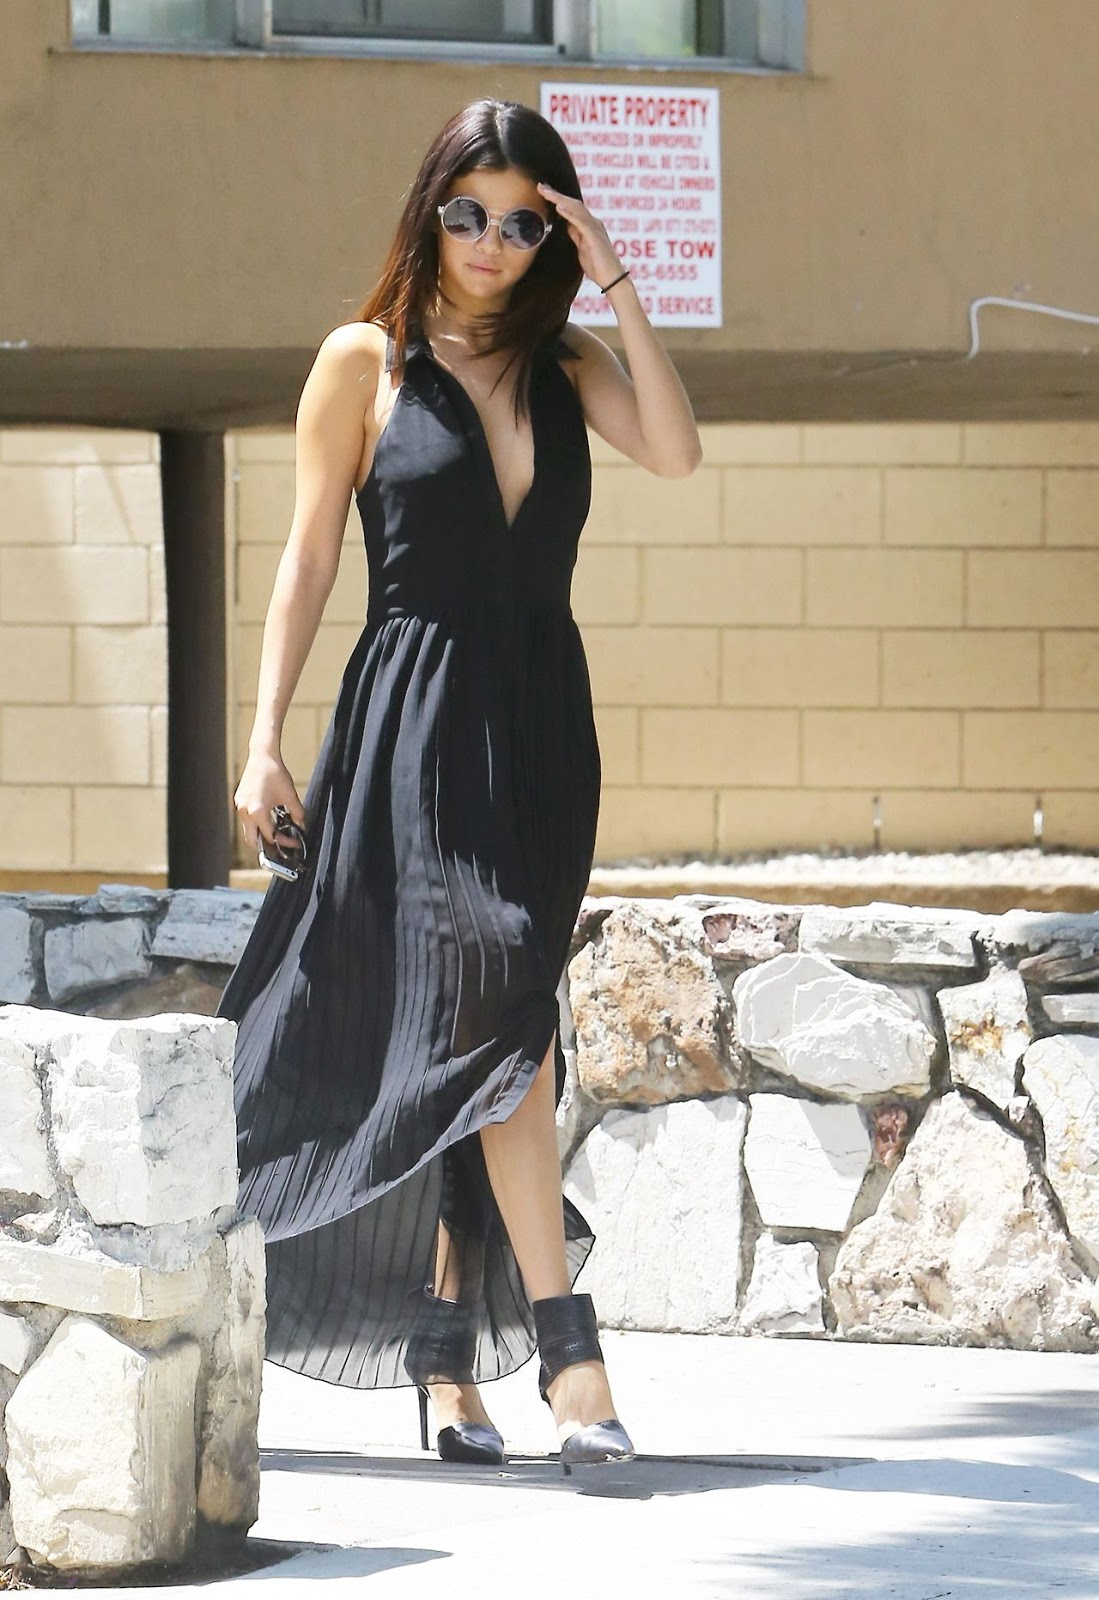 Selena Gomez steps out braless in LA in a sheer black maxi dress